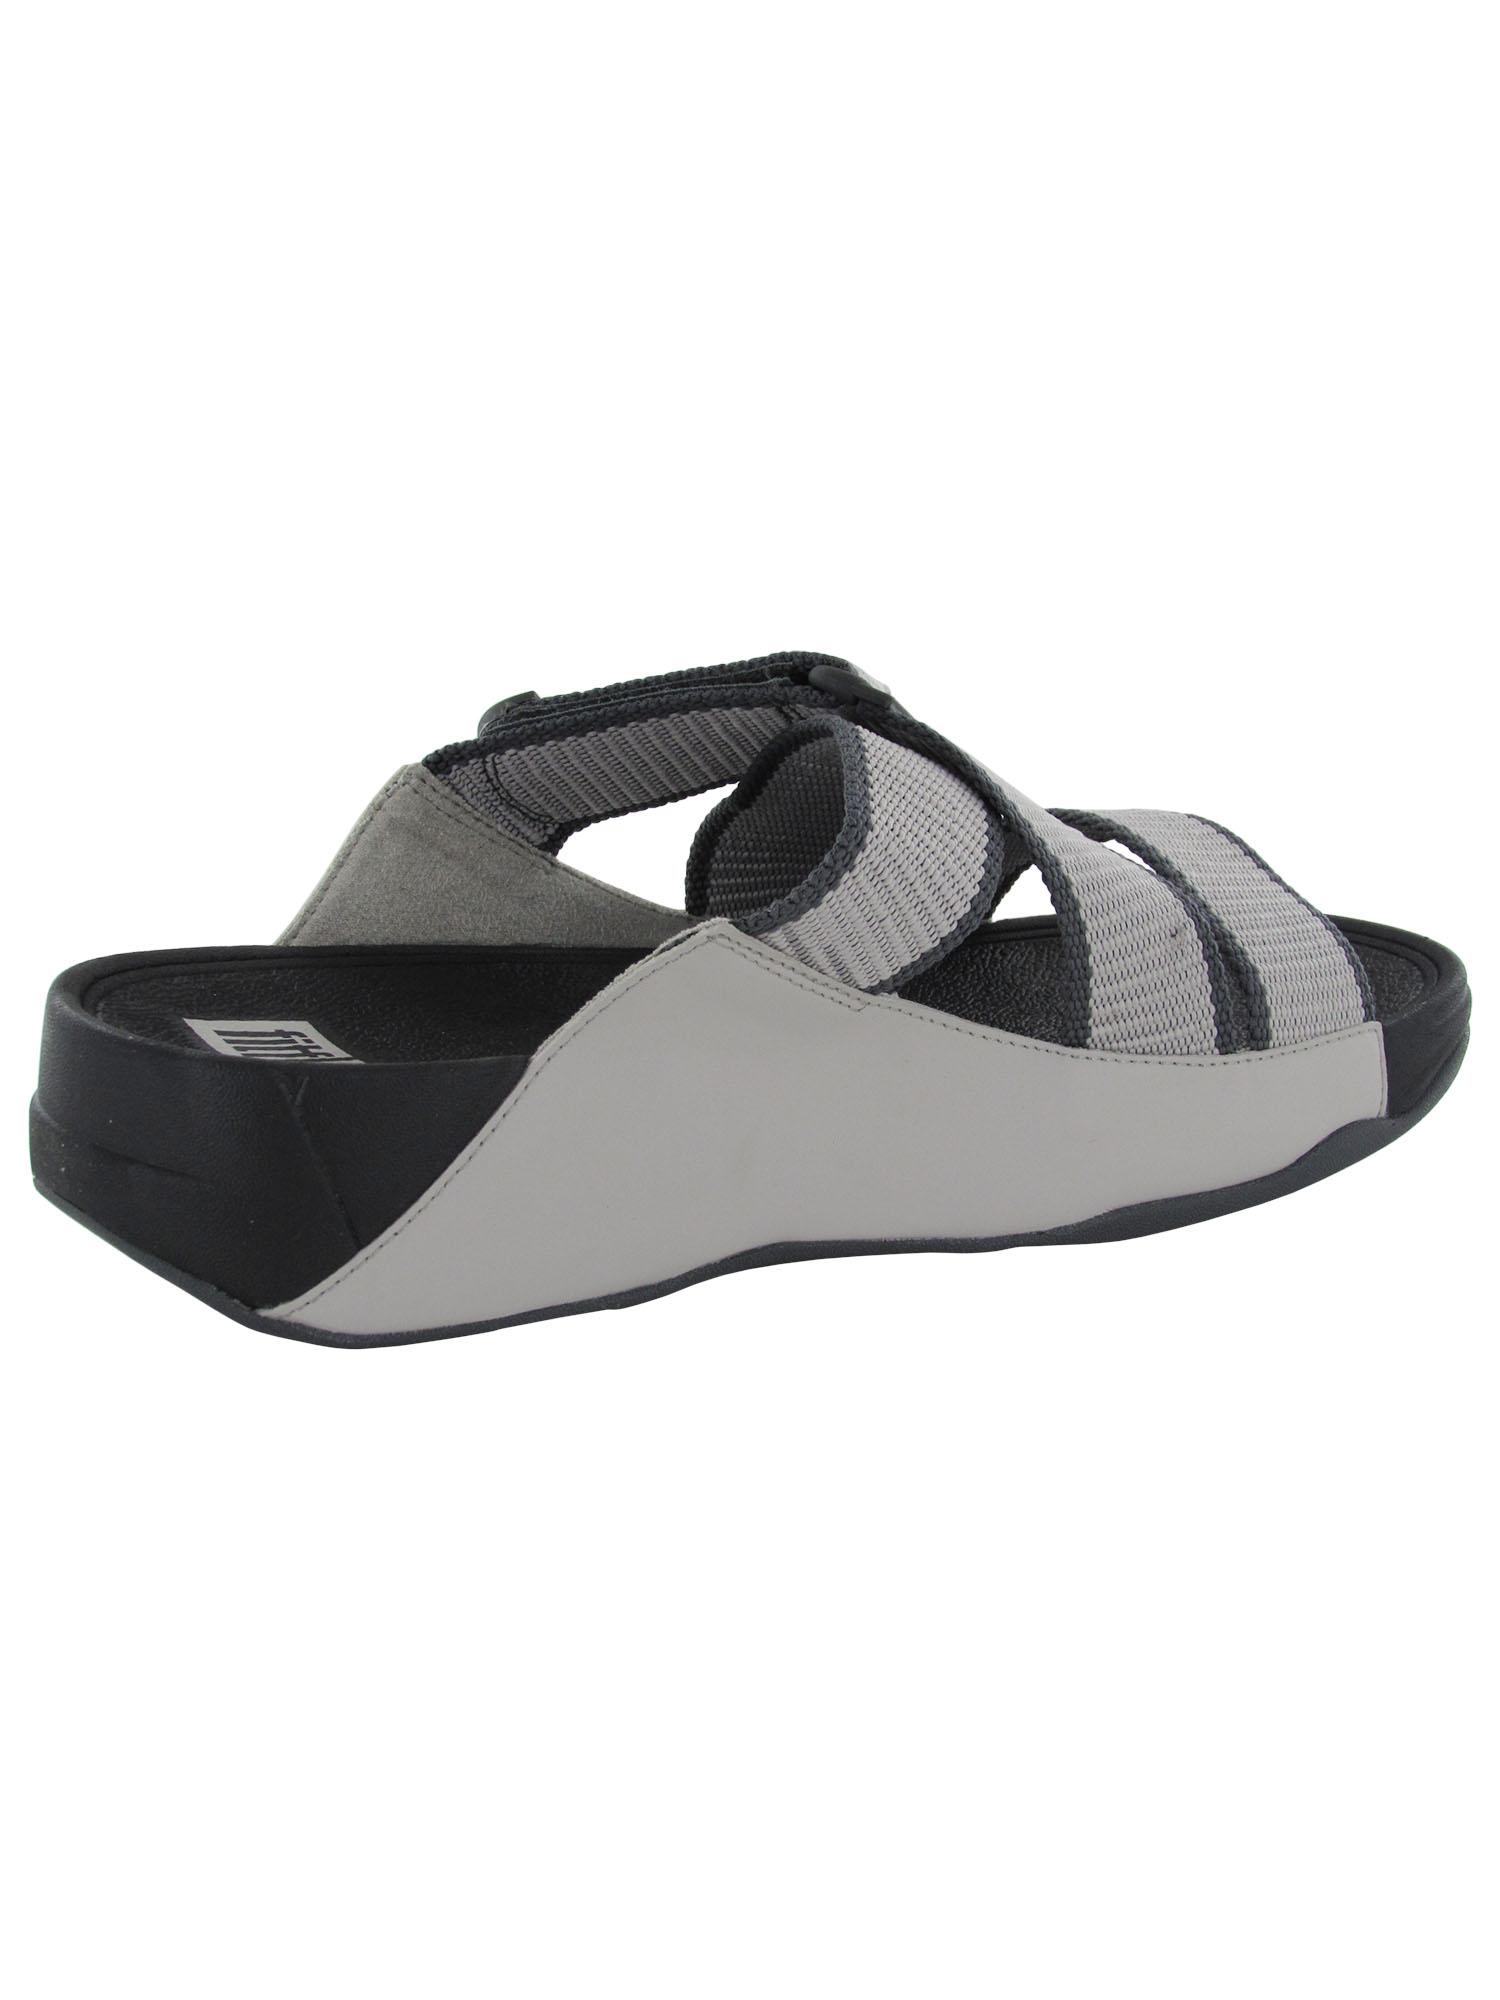 Fitflop-Mens-Sling-II-Webbing-Slide-Sandals thumbnail 13